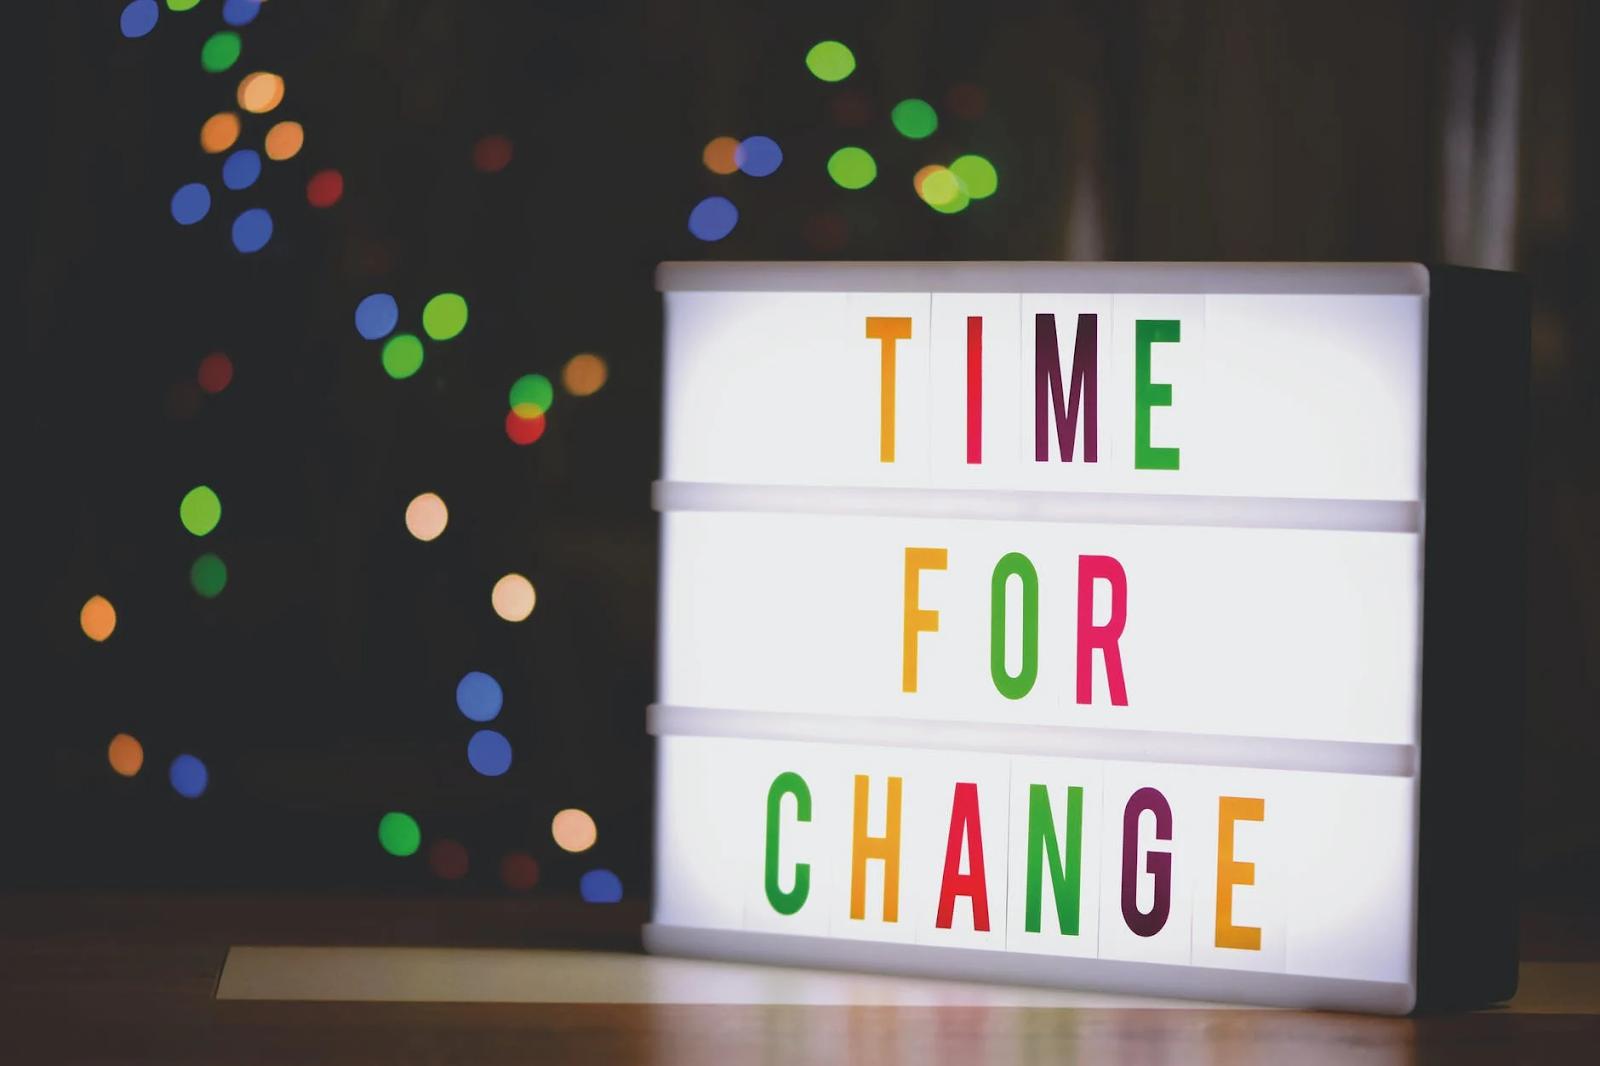 Time For Change - Es hora del cambio